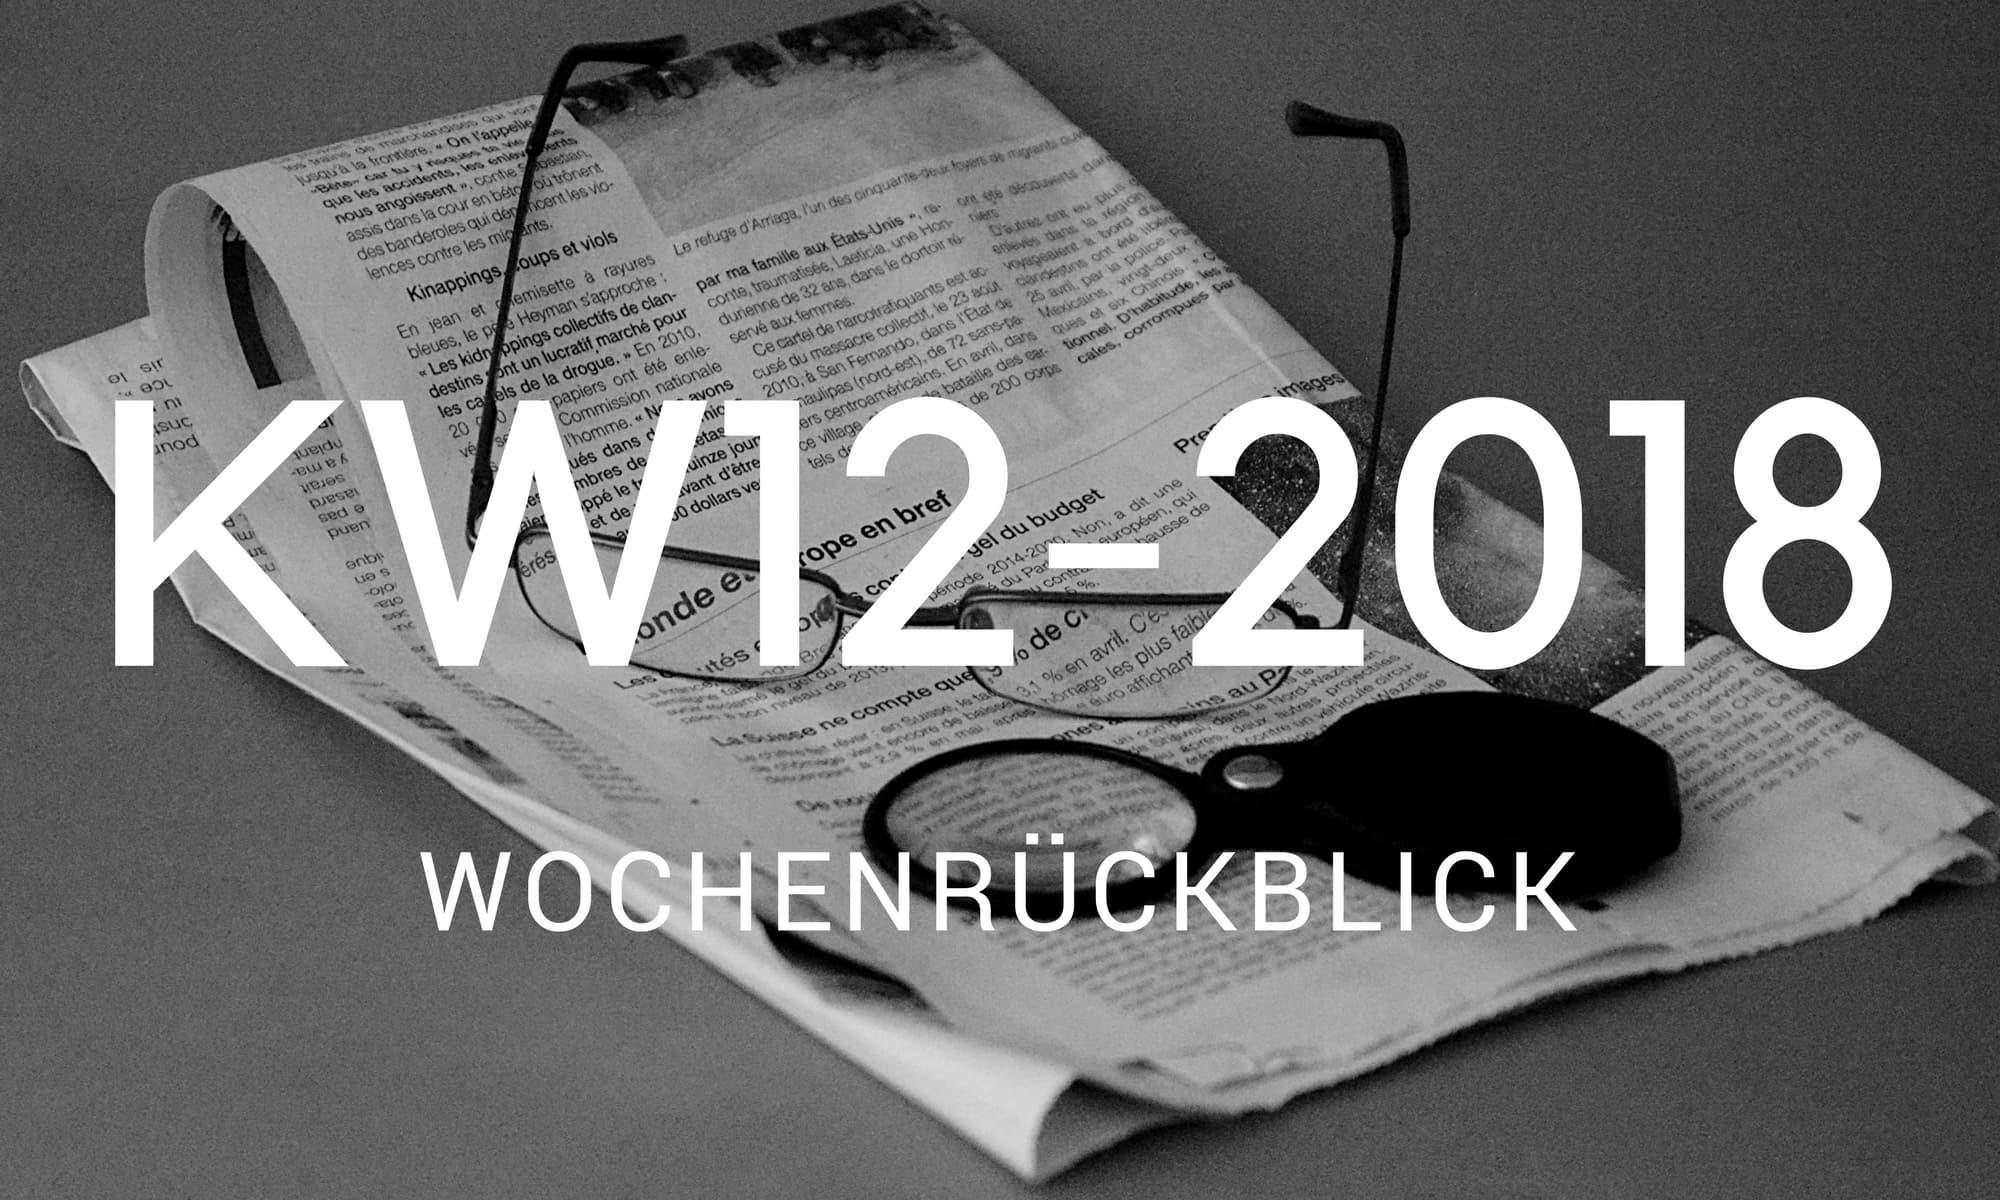 wochenrueckblick camping news KW12 2018